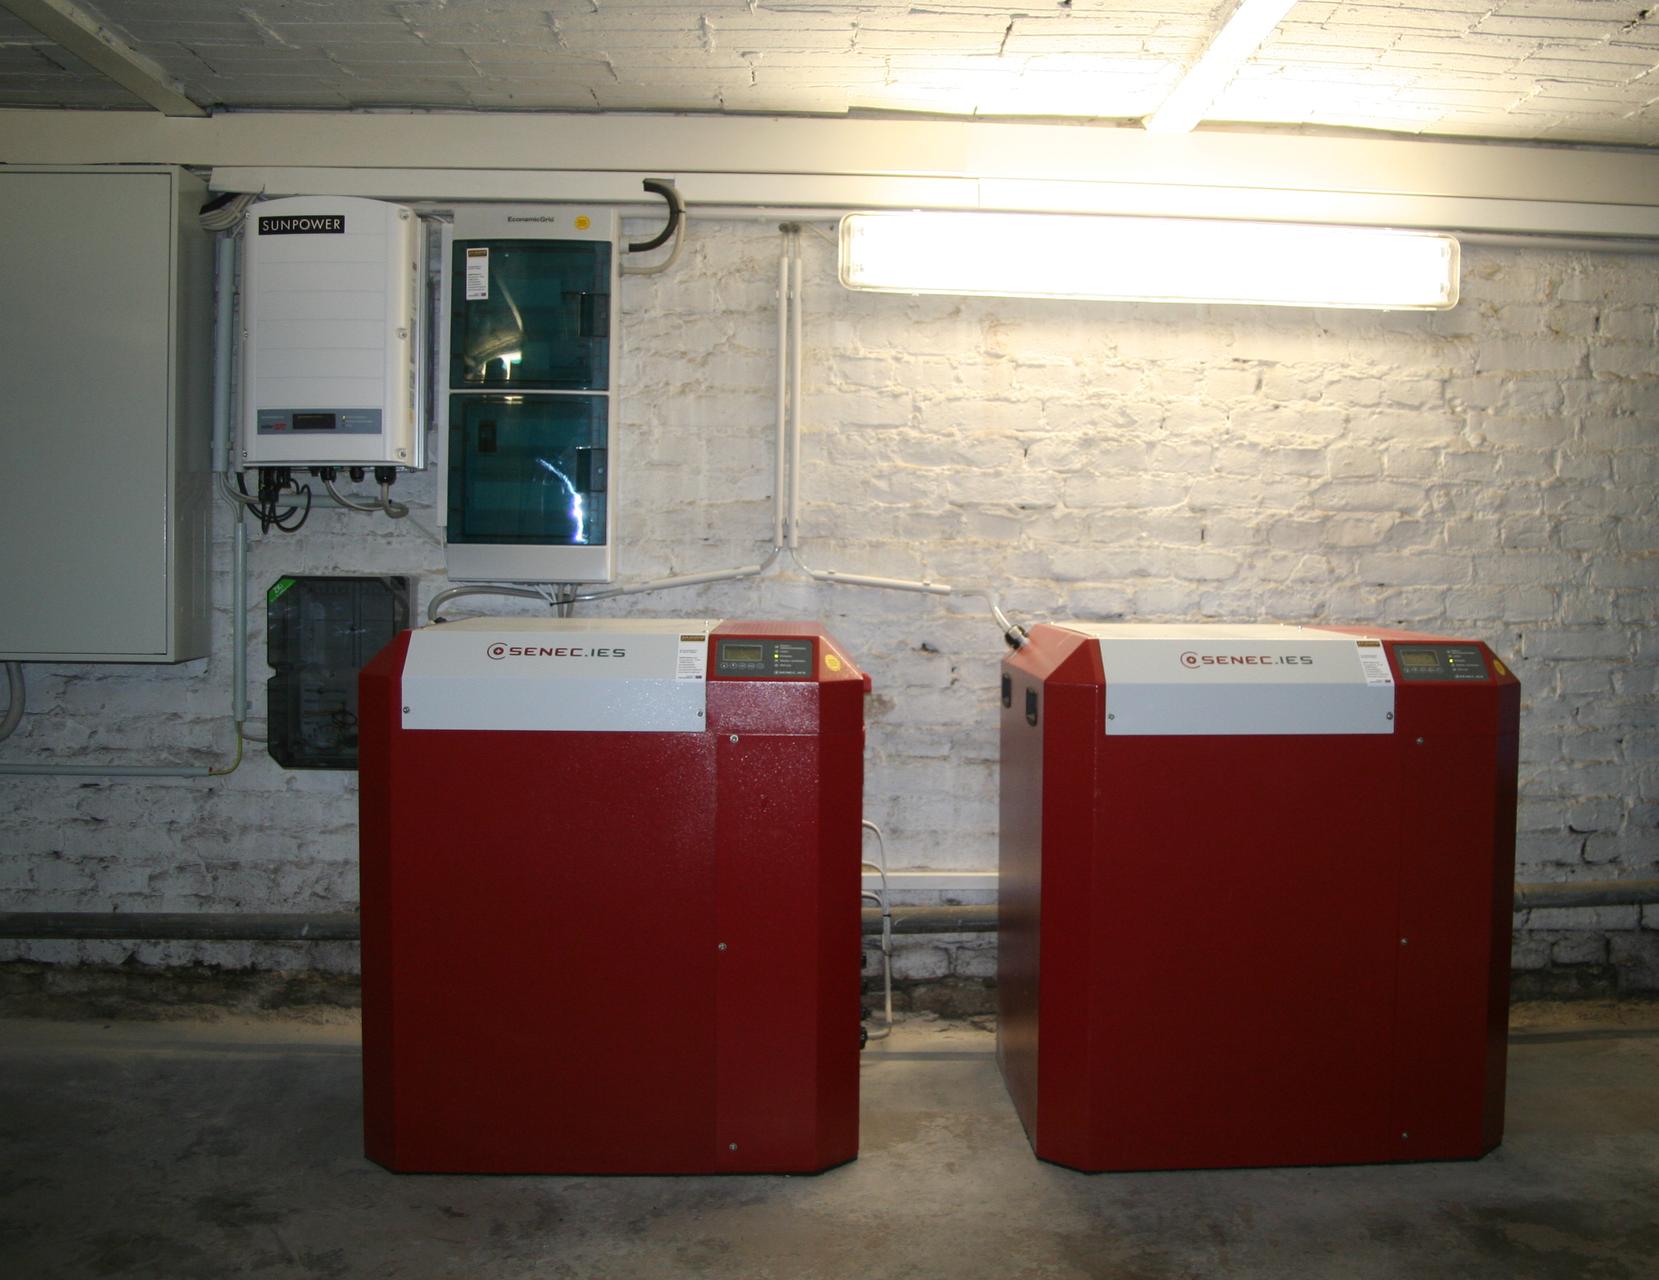 2x 8 kWh Pb Speicher SENEC.IES mit EconamicGrid in Berlin